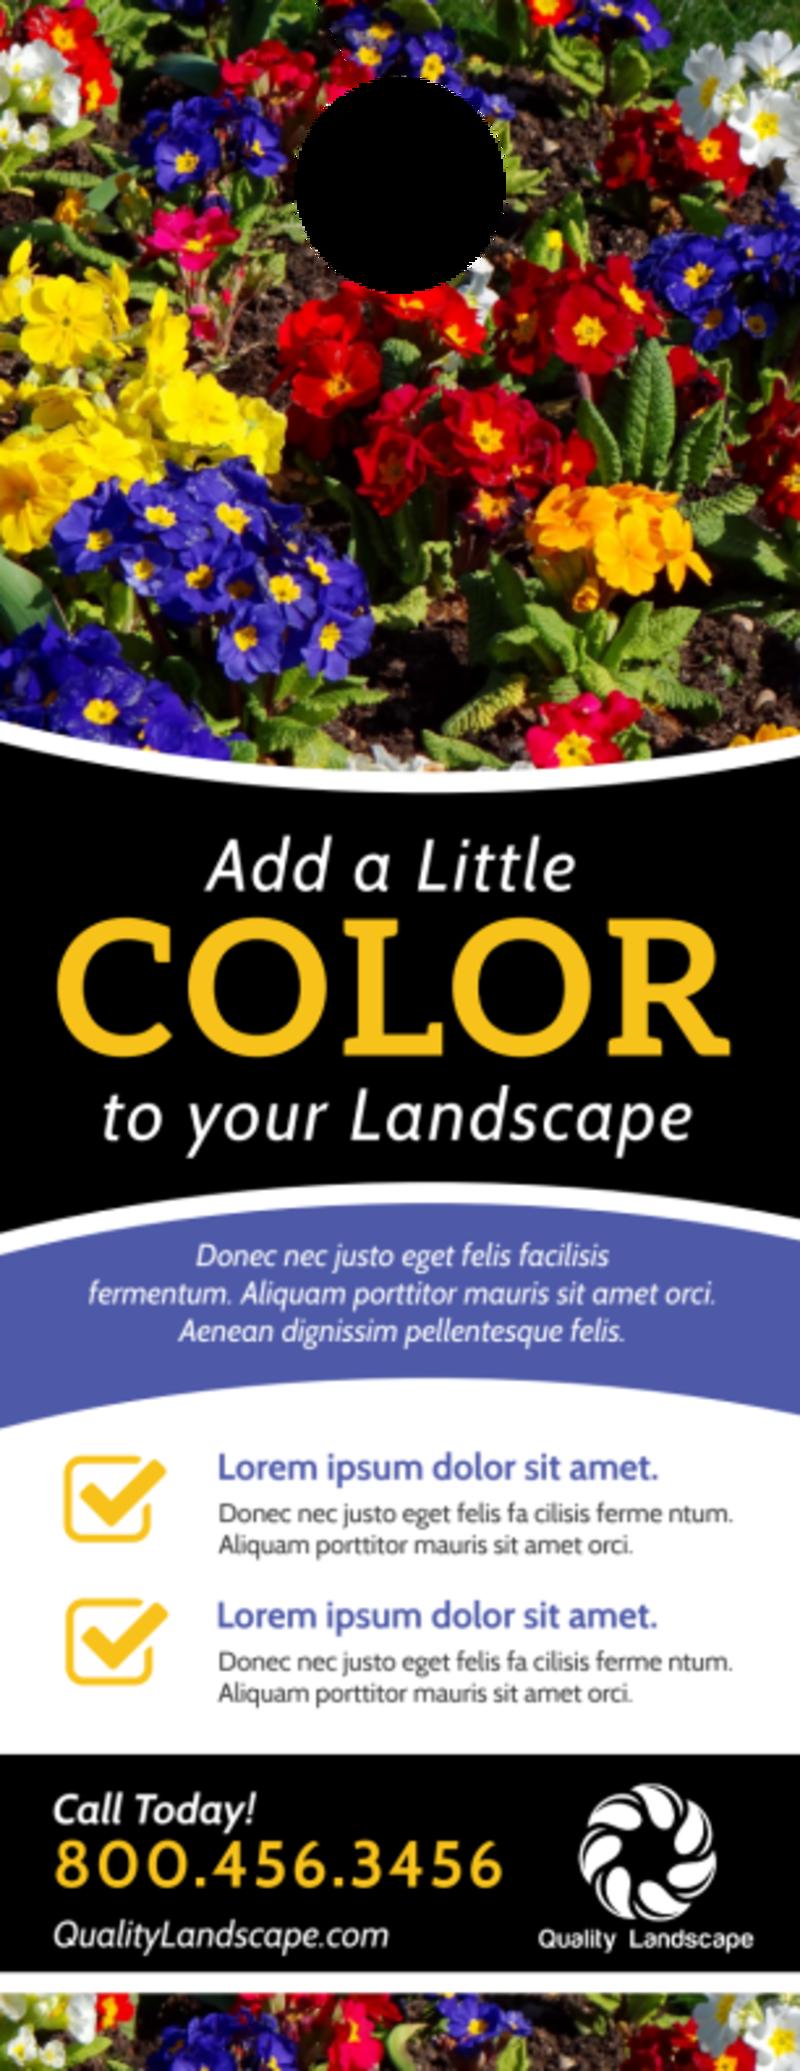 Colorful Landscaping Door Hanger Template Preview 2